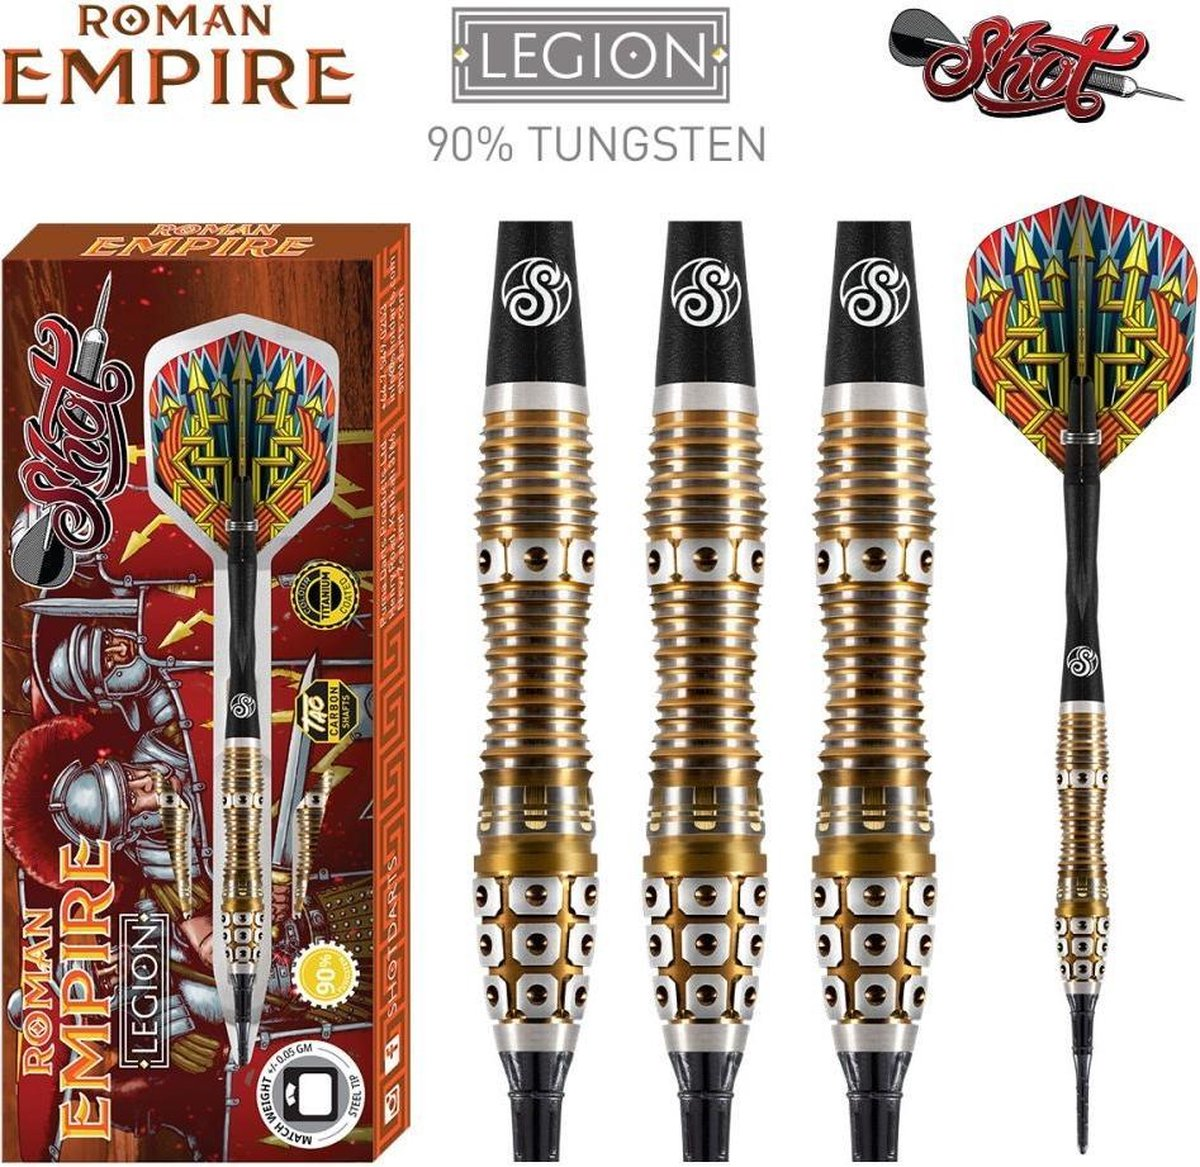 Shot Roman Empire Legion 90% Soft Tip - 20 Gram